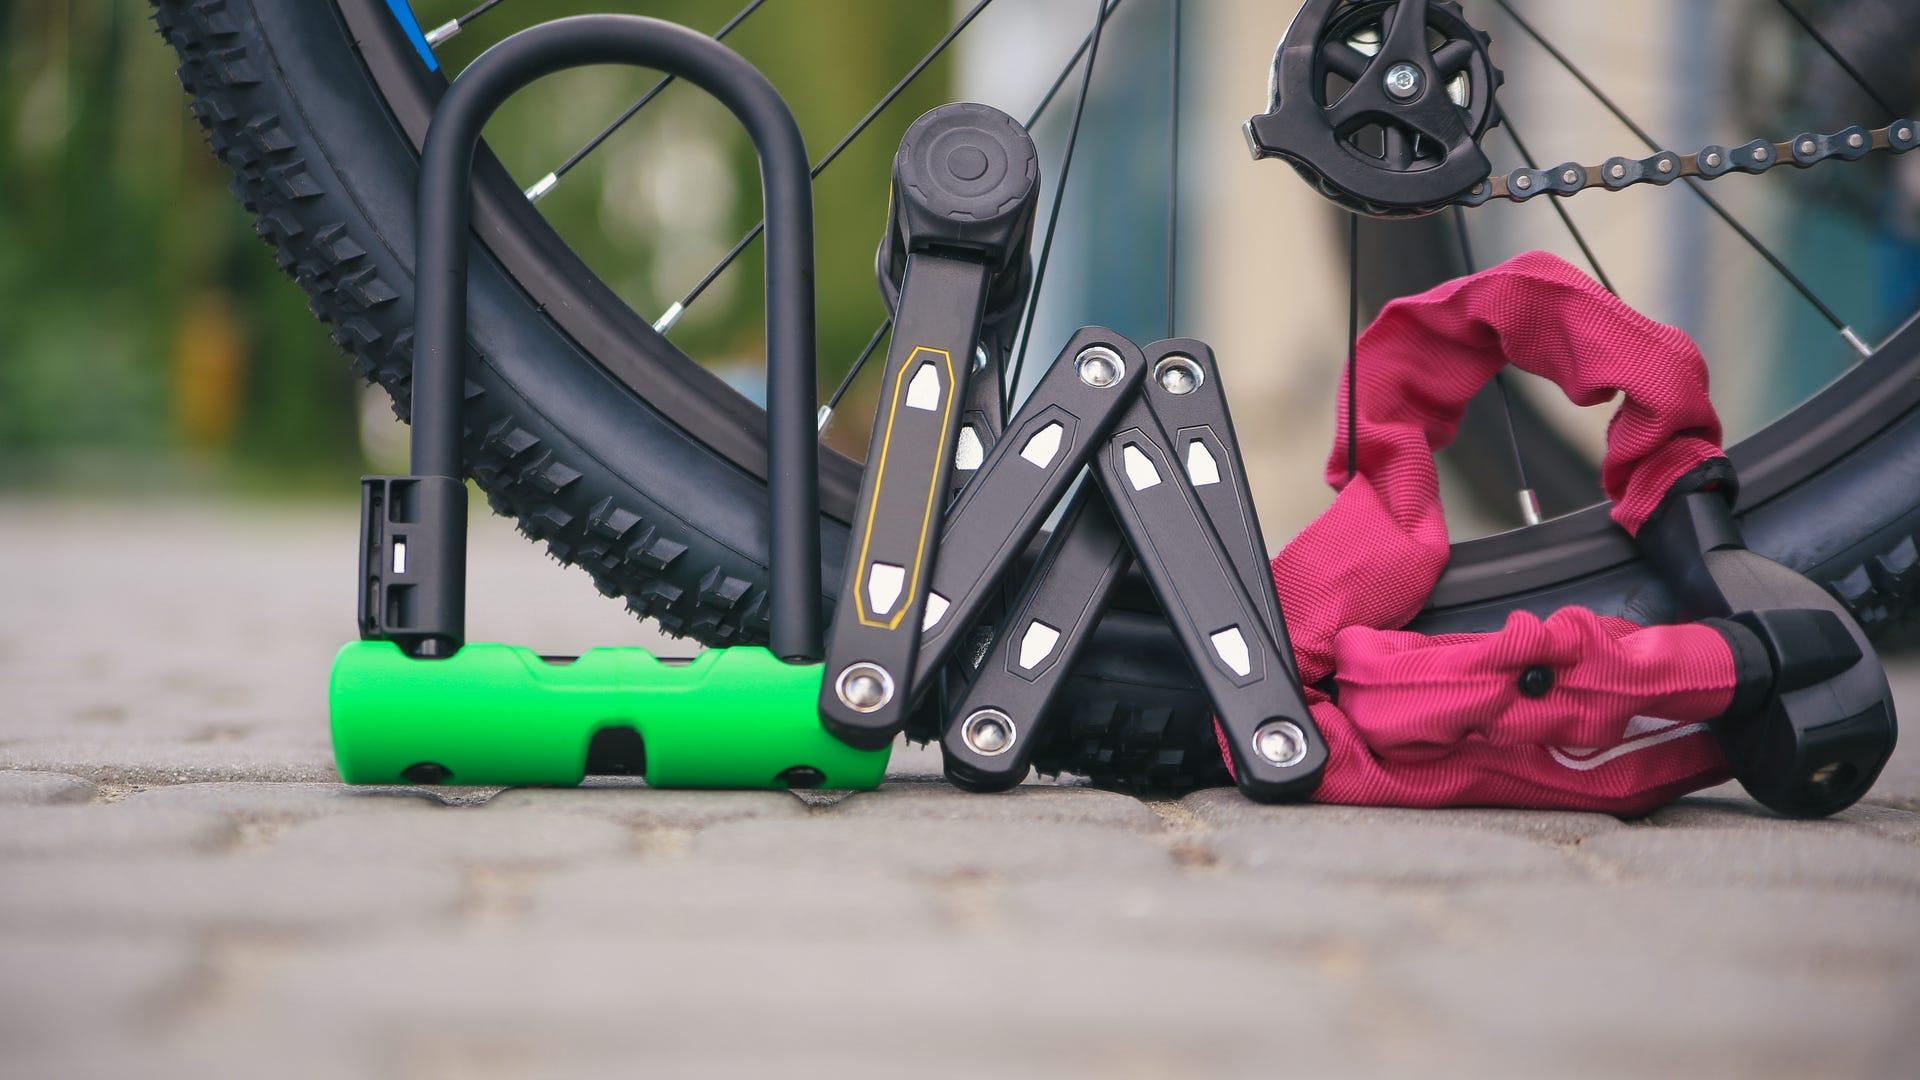 Three different types of bike locks rest by a bike tire.